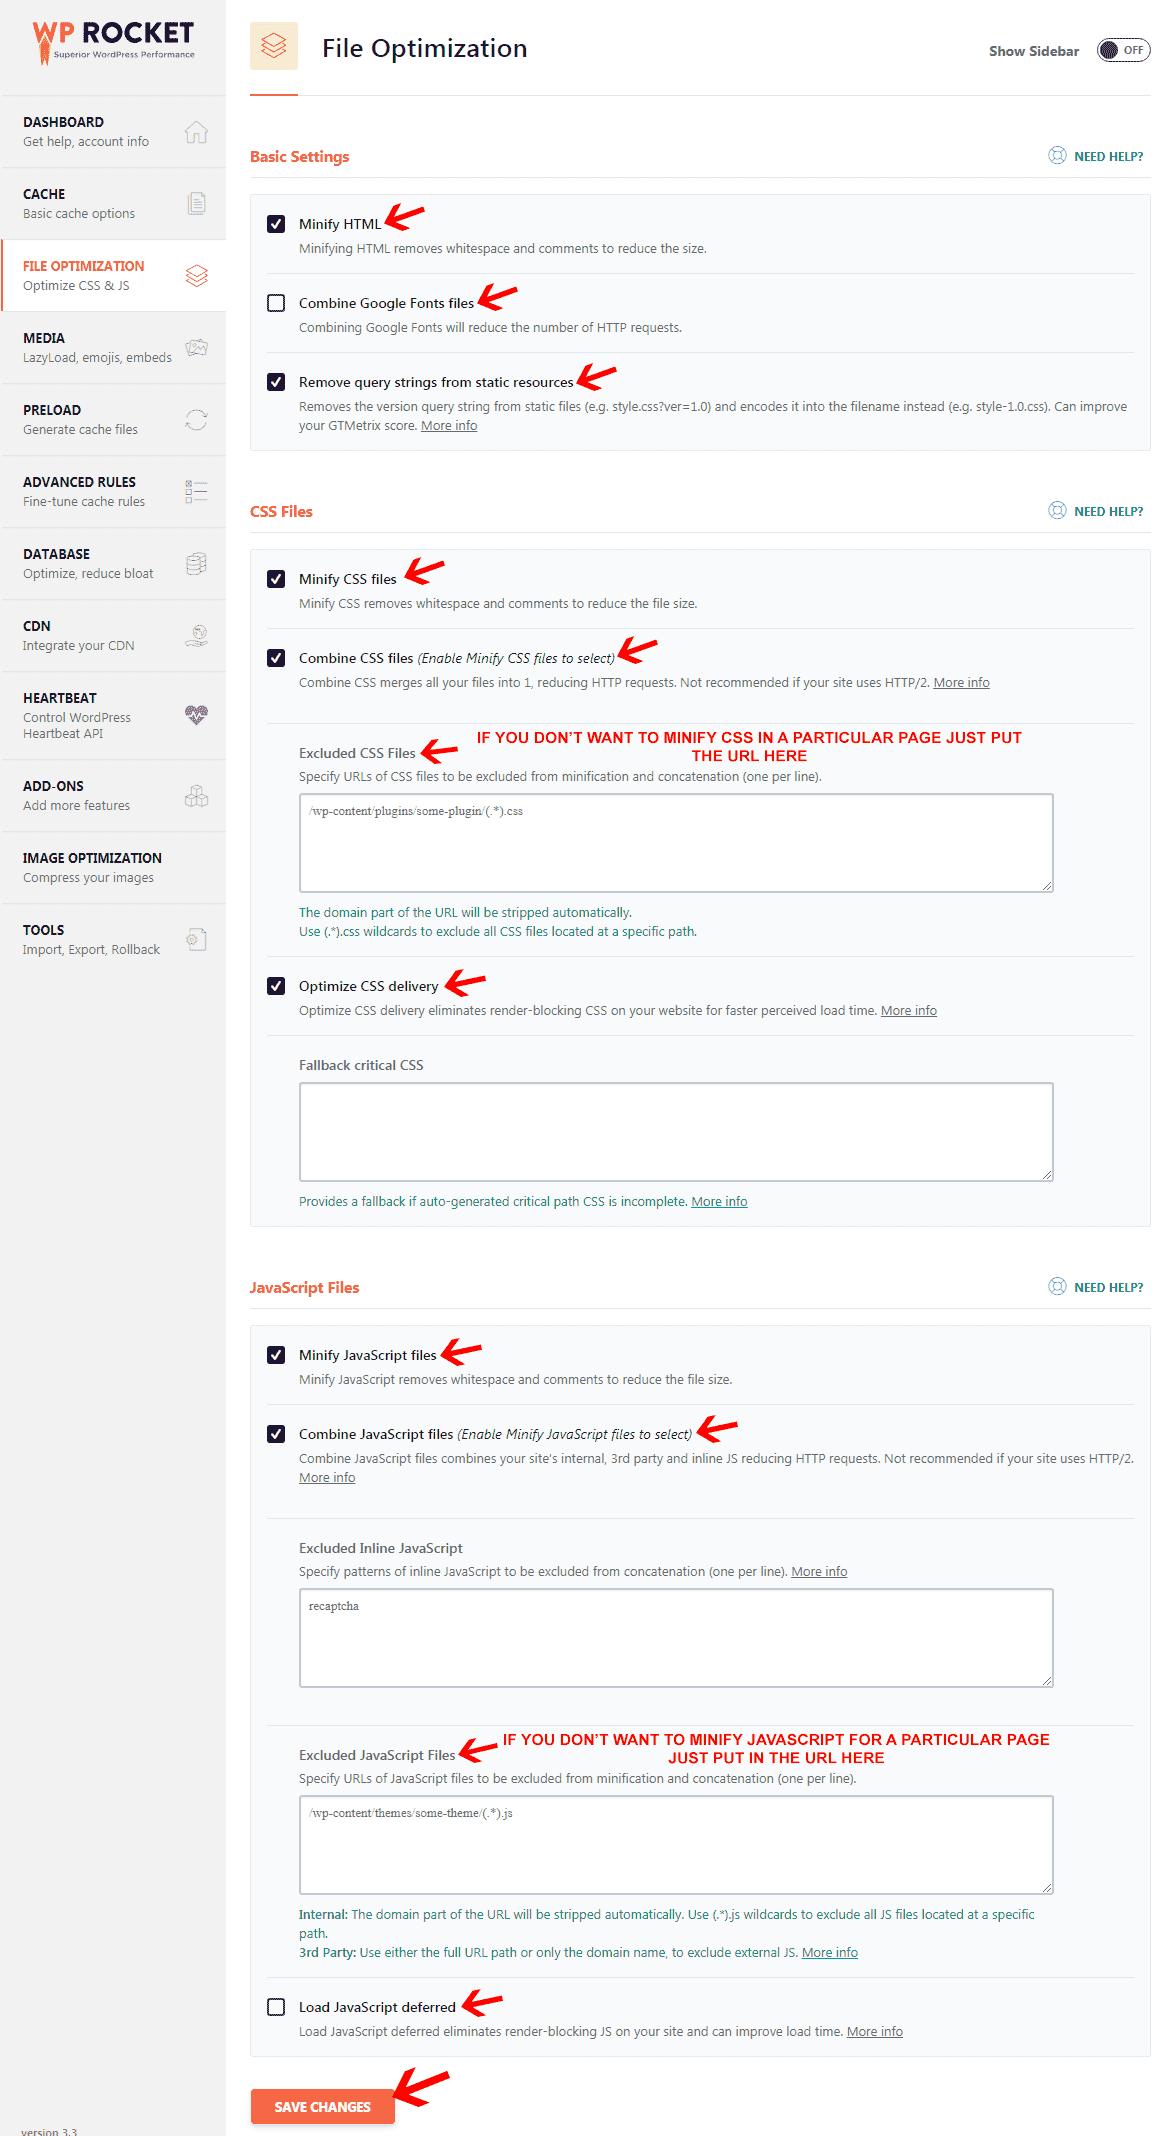 WP Rocket file optimization settings